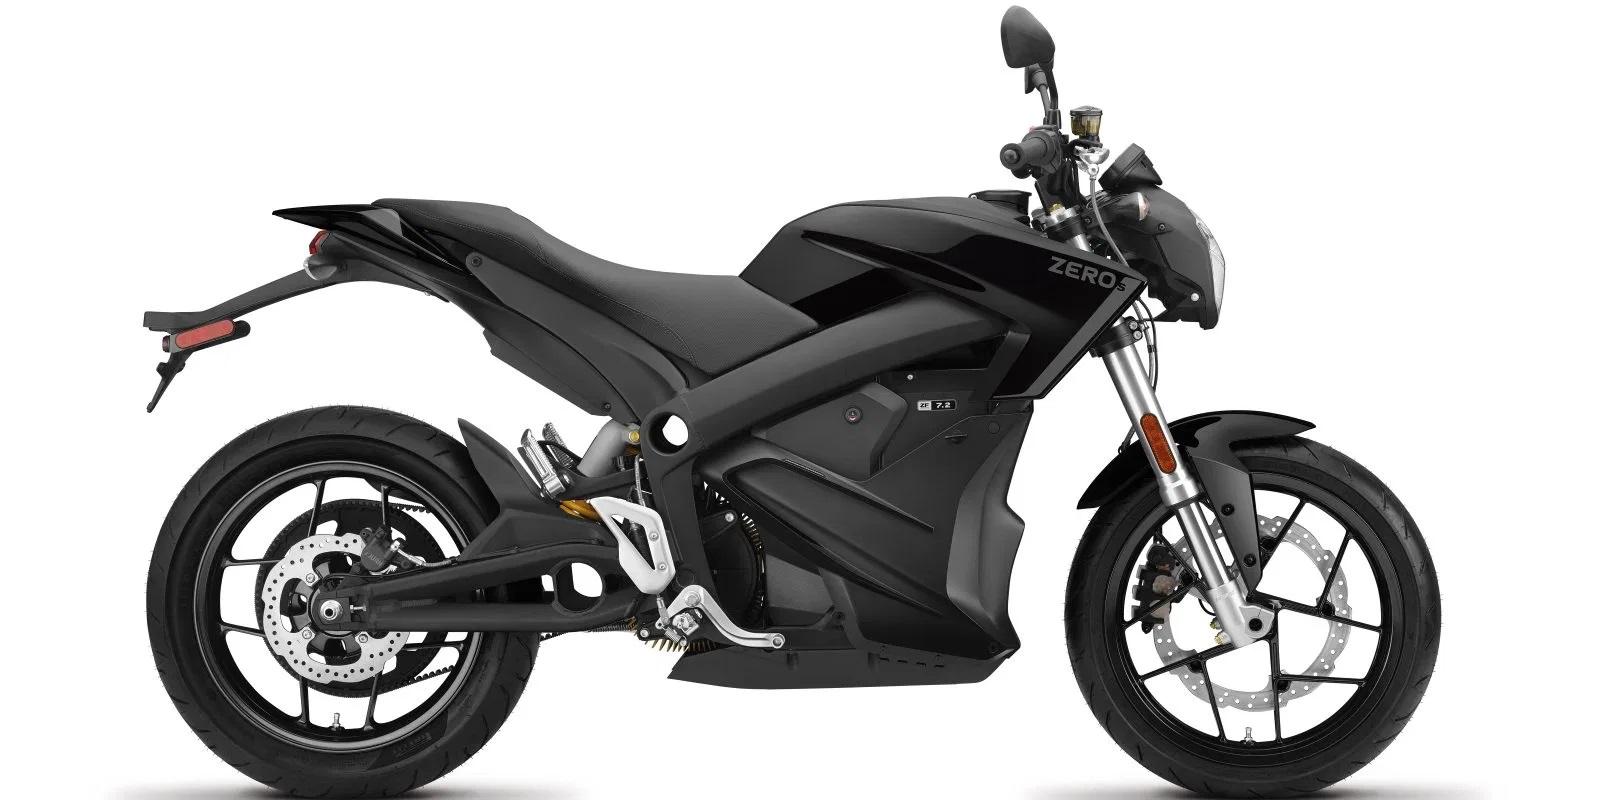 KTM Duke – A Common Sports Bike in India